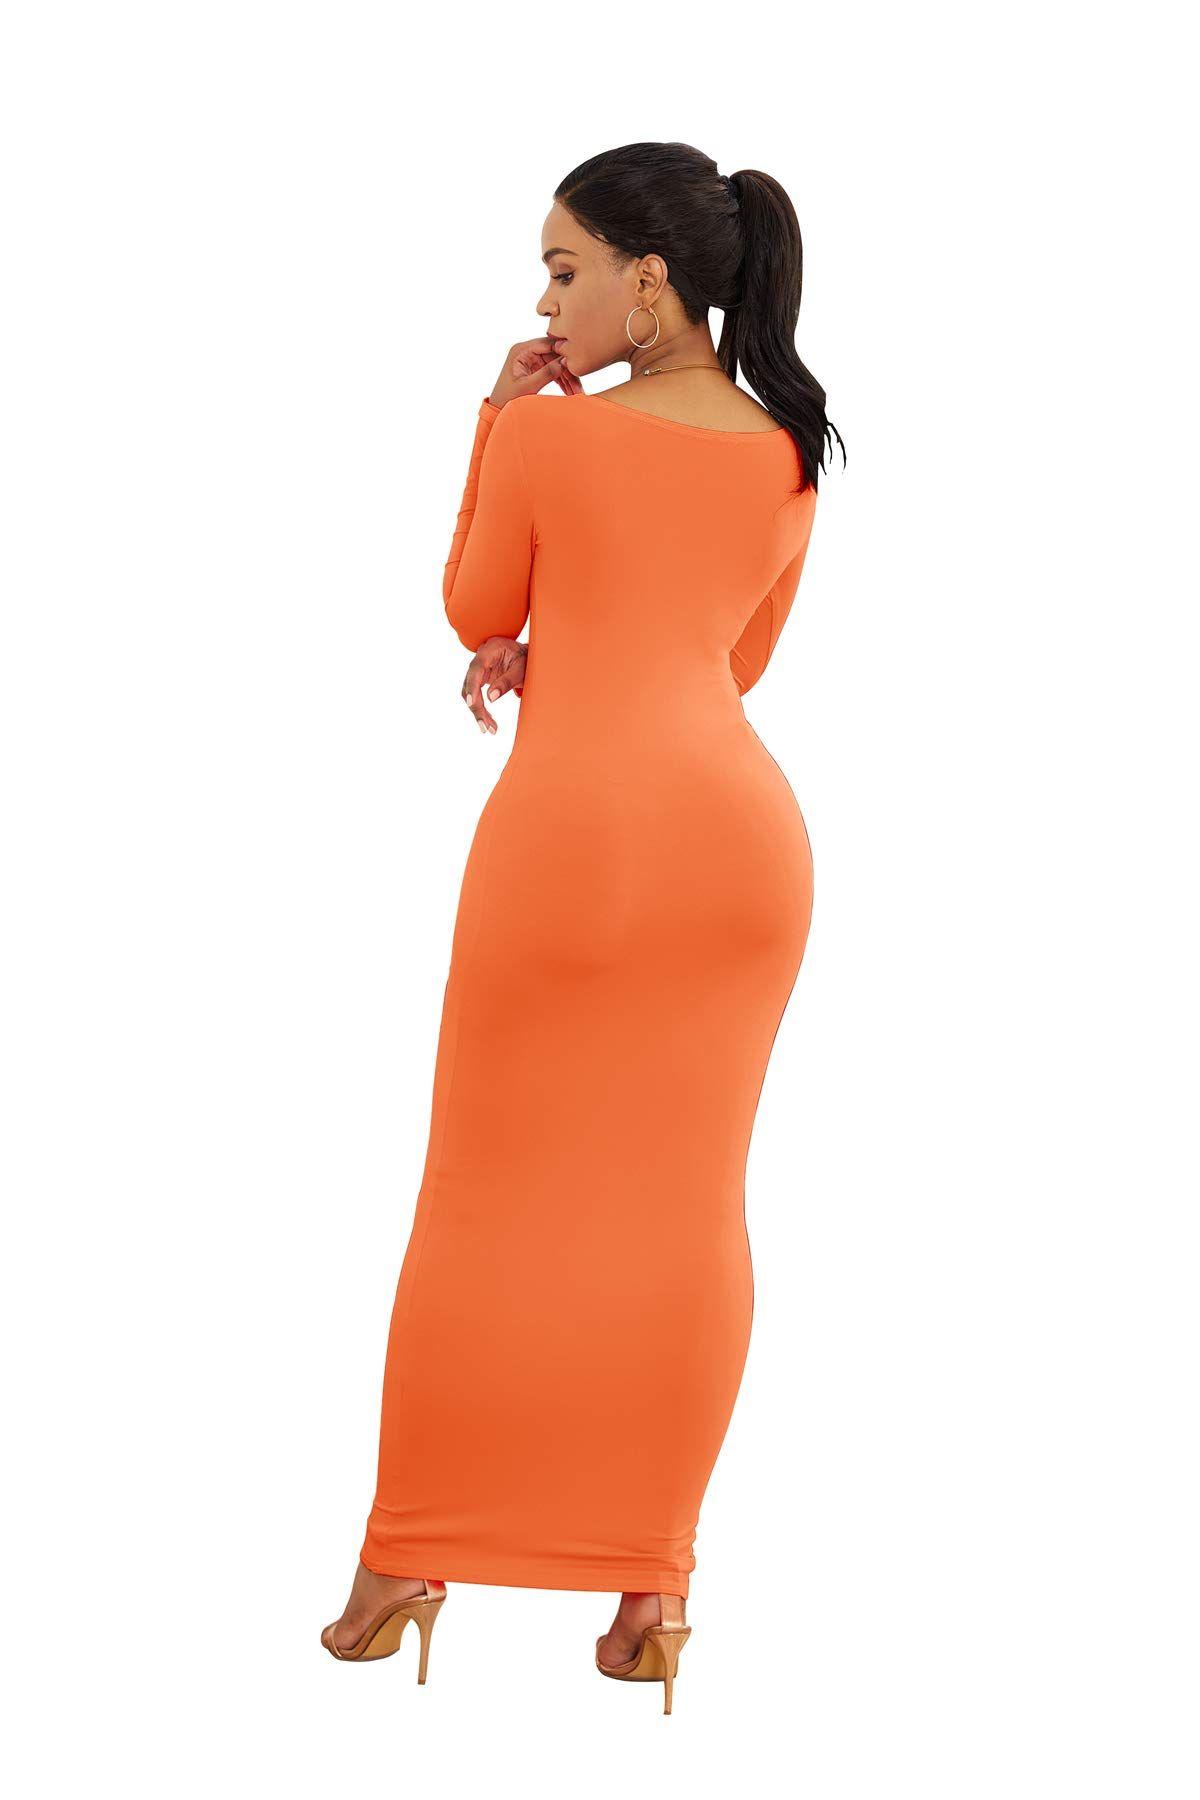 Womens Casual Sleeve Simple Bodycon Orange Long Sleeve Dress Casual Dresses For Women Racerback Maxi Dress [ 1800 x 1200 Pixel ]